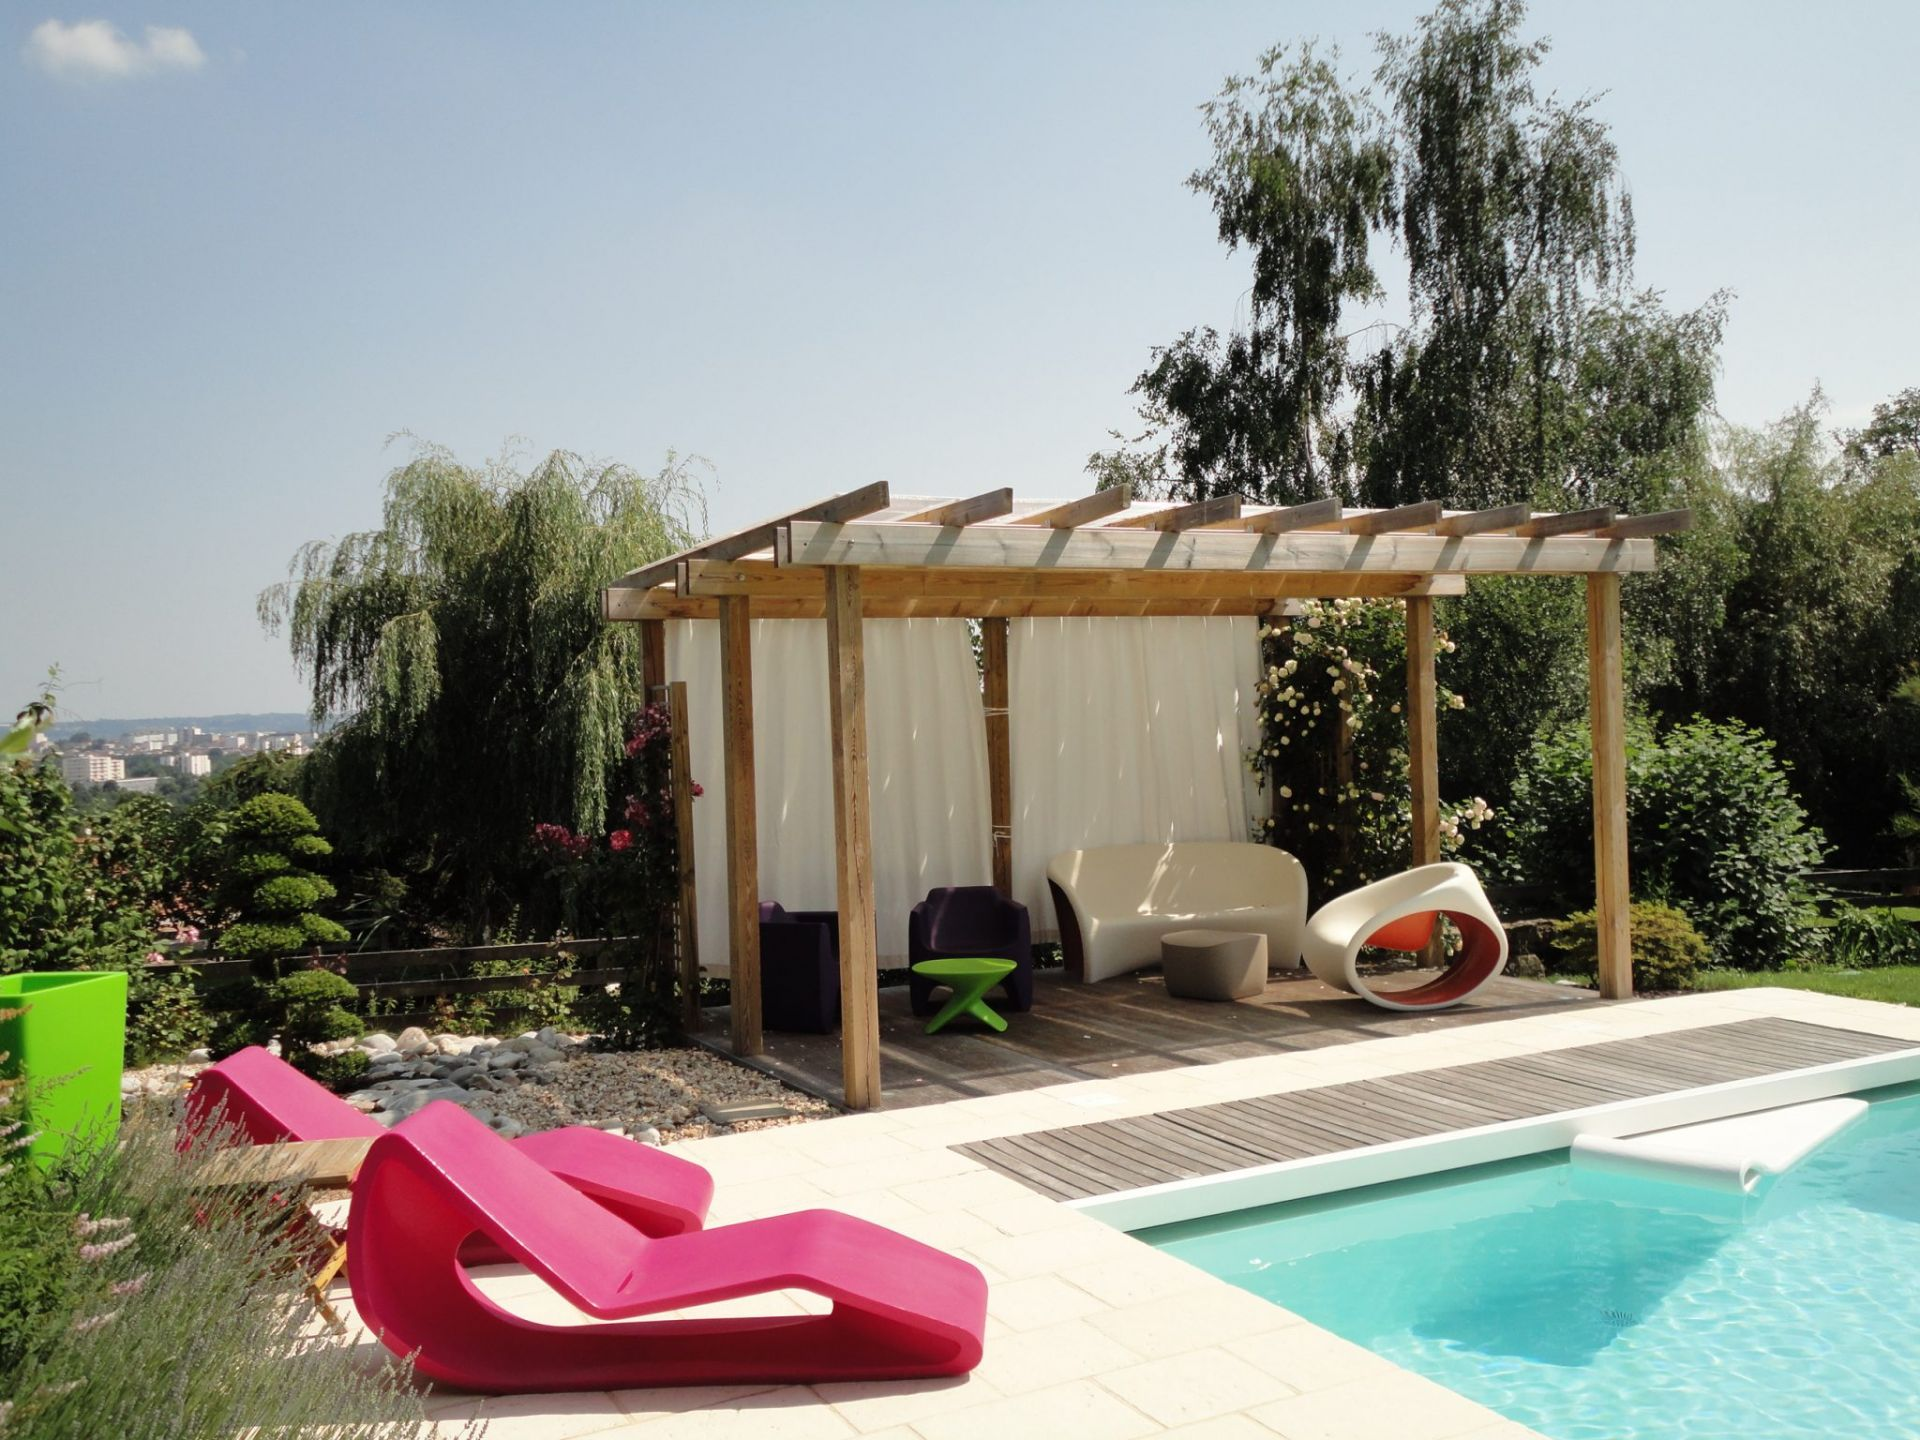 Rebeyrol créateur de jardin, terrasse, piscine, aménagement de jardin